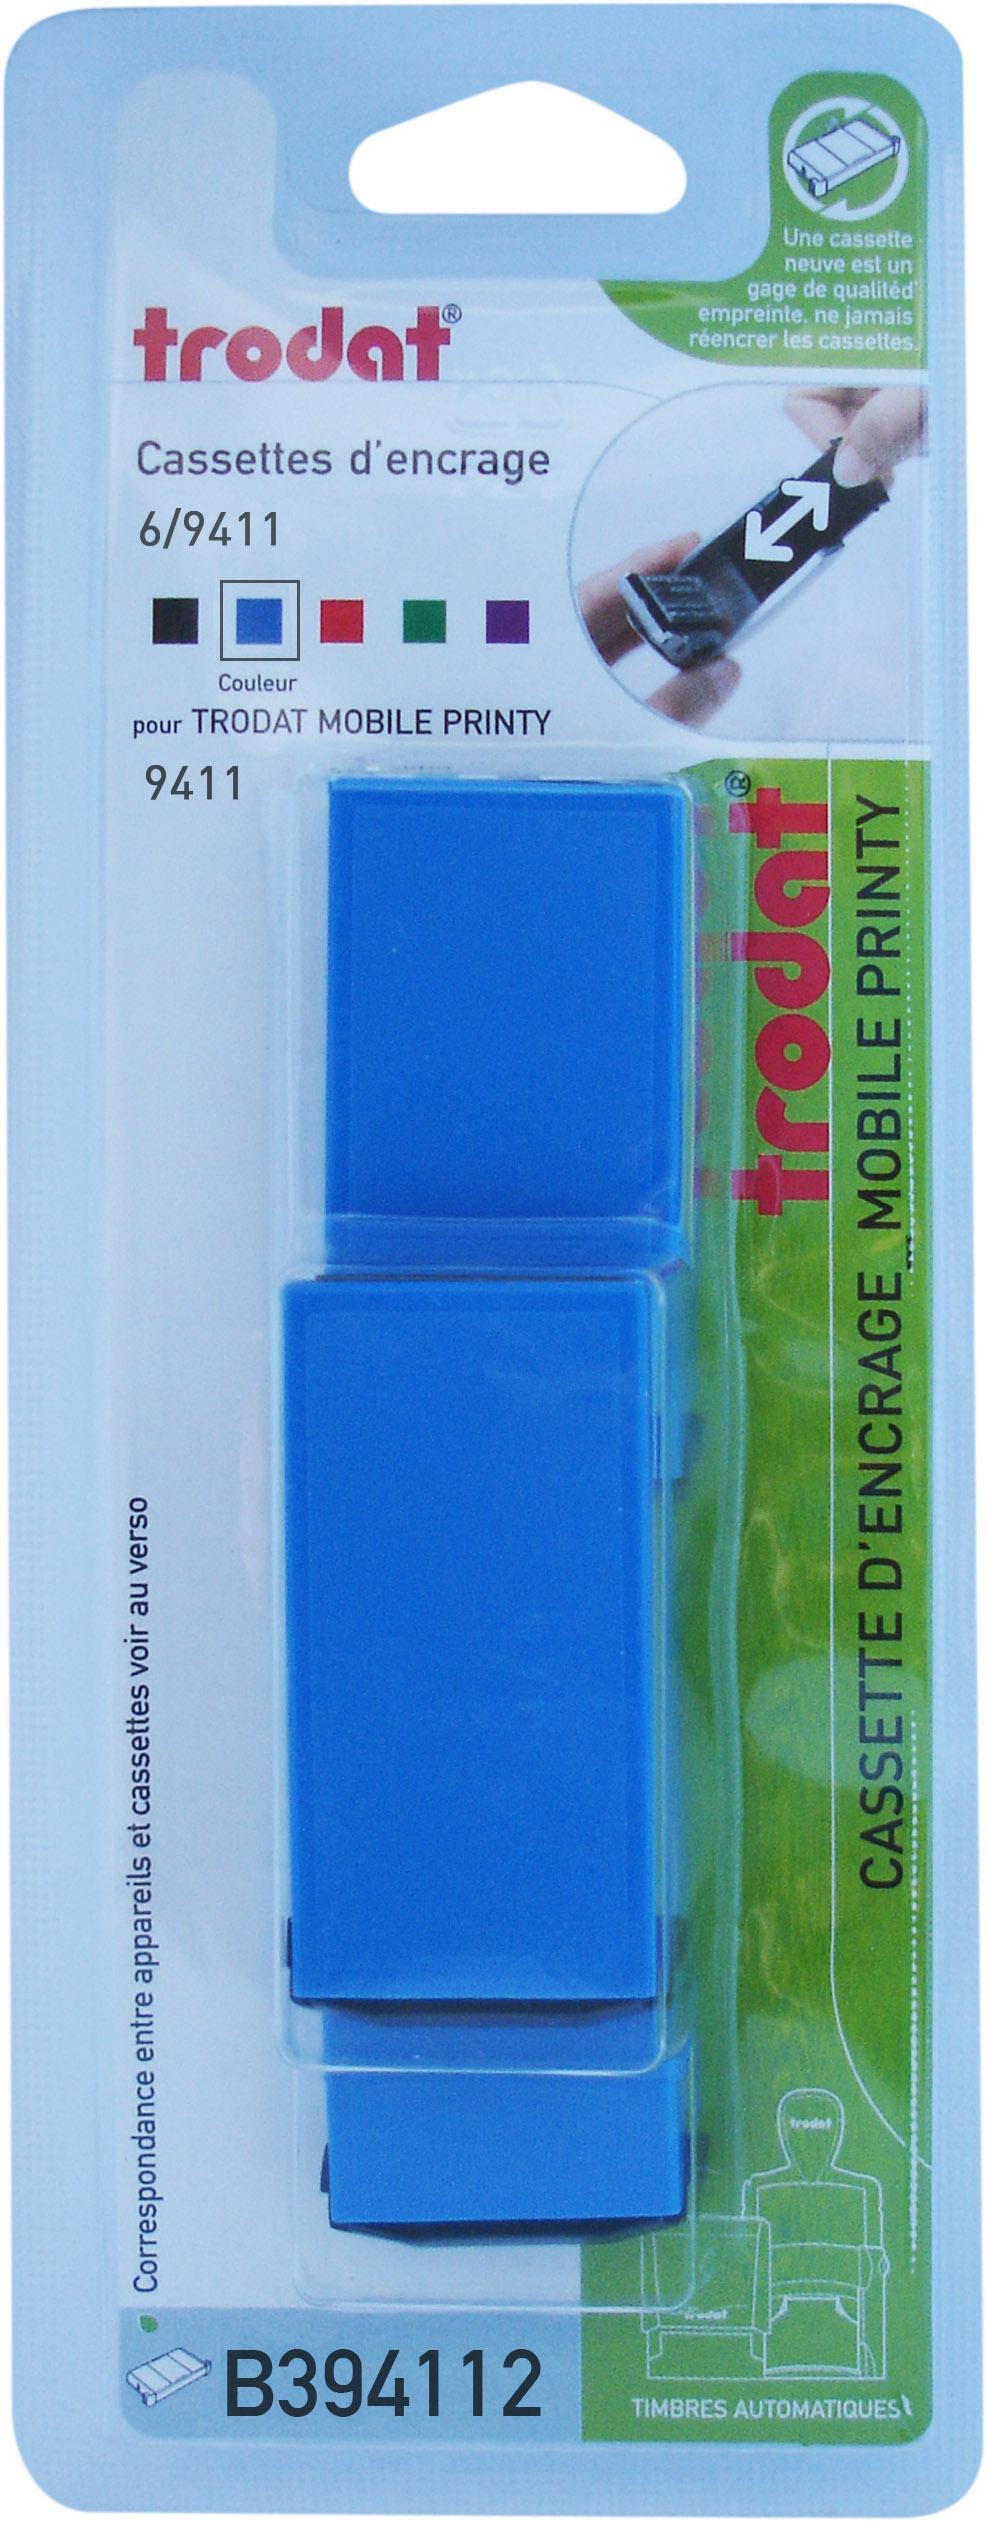 Trodat - 3 Encriers 6/9411 recharges pour tampon Mobile Printy 9411 - bleu